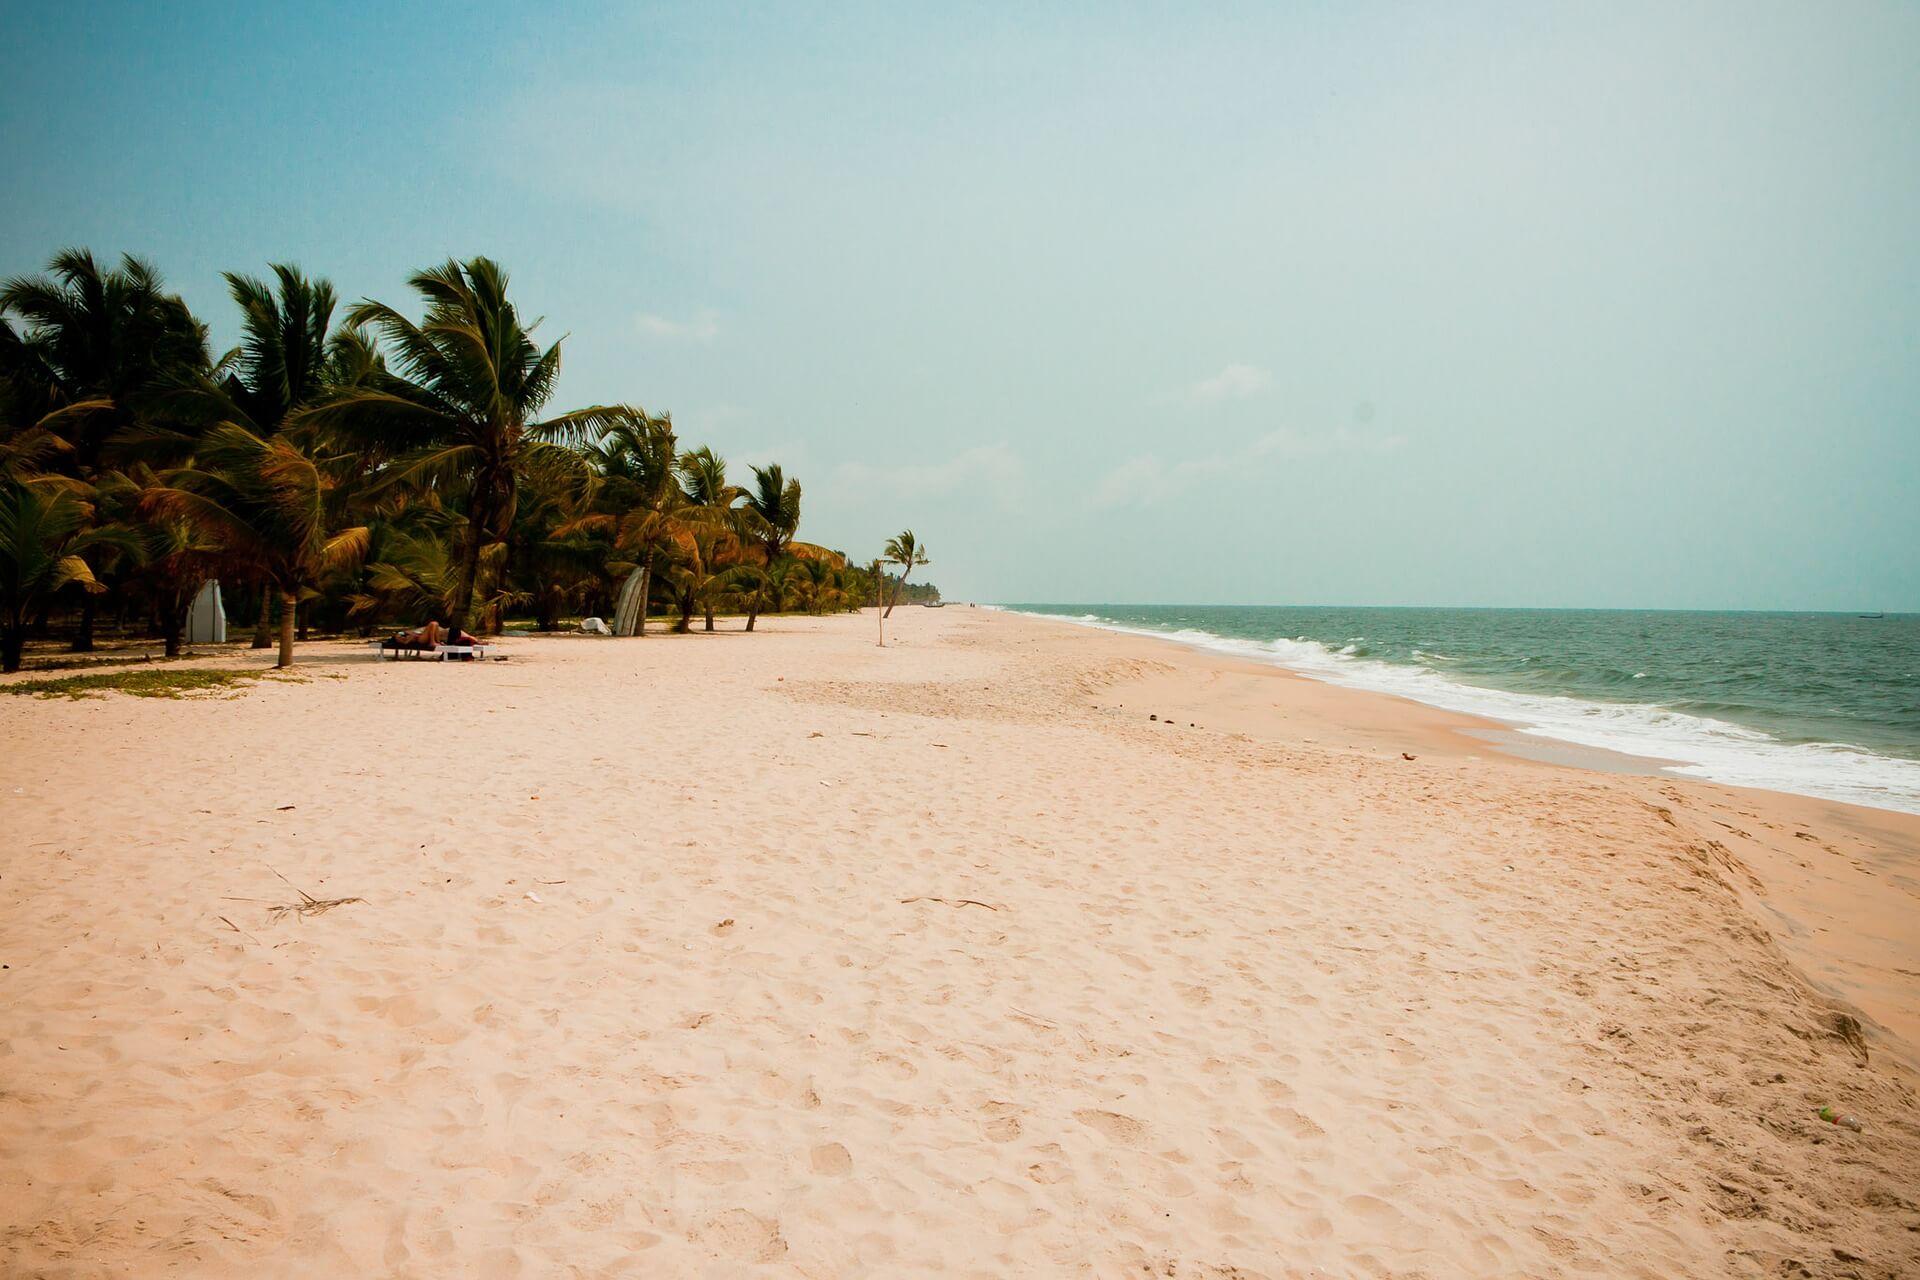 beachs-beach-india-ken